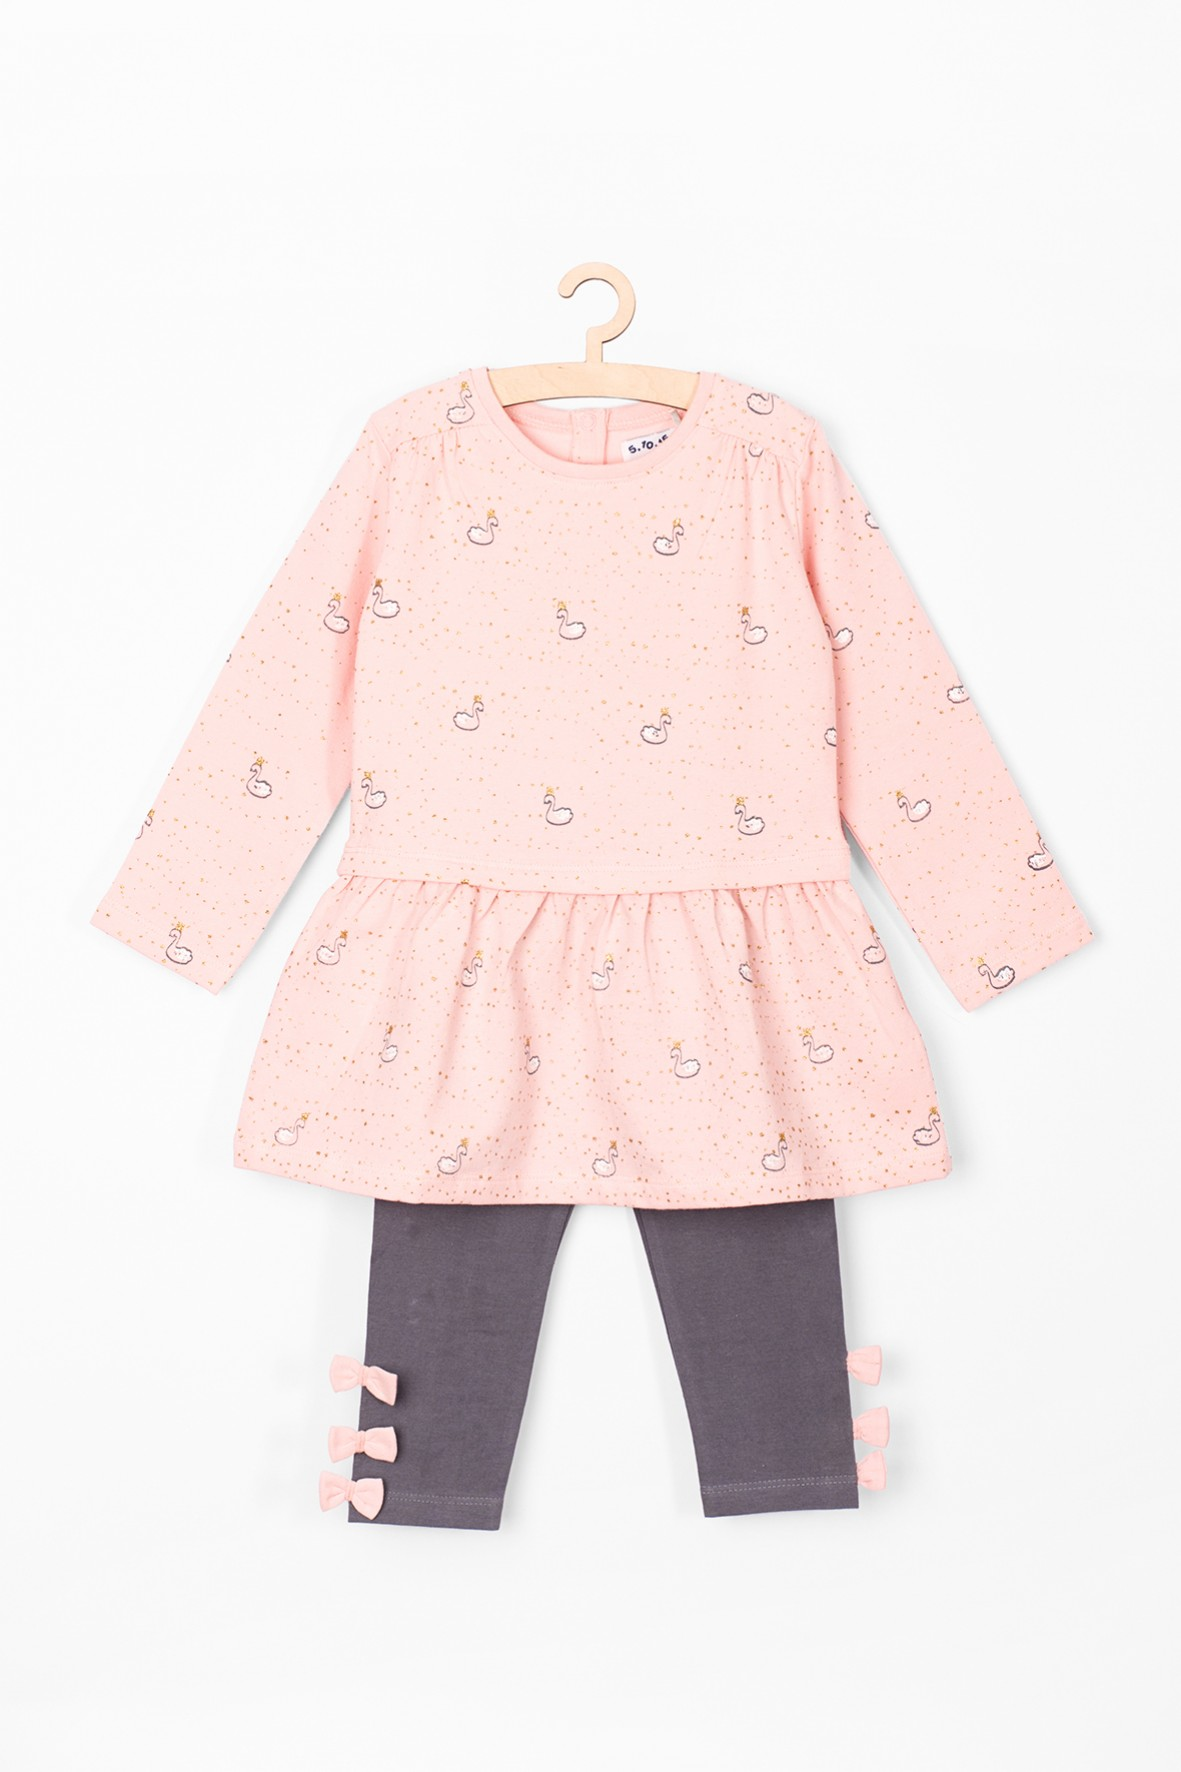 Komplet ubrań dla niemowlaka-  tunika i leginsy